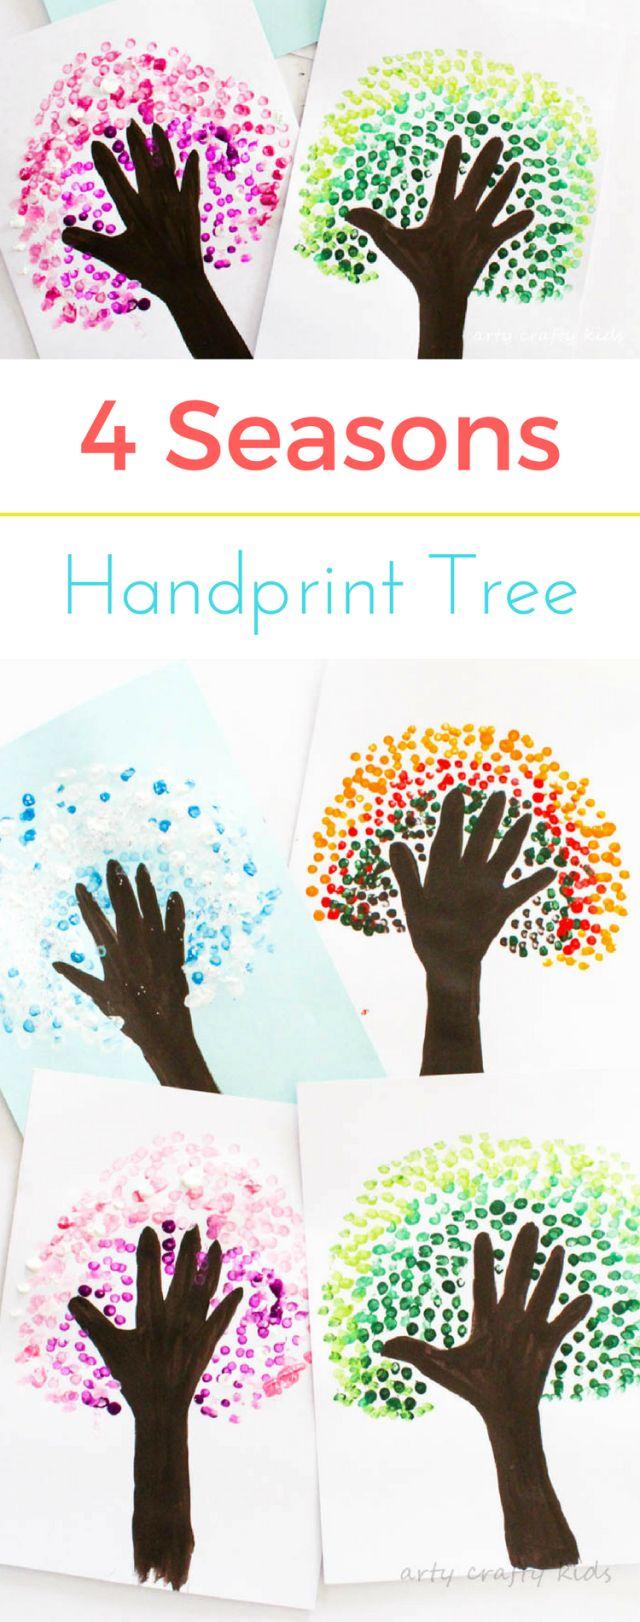 Arty Crafty Kids   Art   Four Season Handprint Tree   A fun seasonal art project for kids. Create Autumn, Winter, Spring and Summer Handprint Trees - a great way for preschoolers to observe seasonal change!